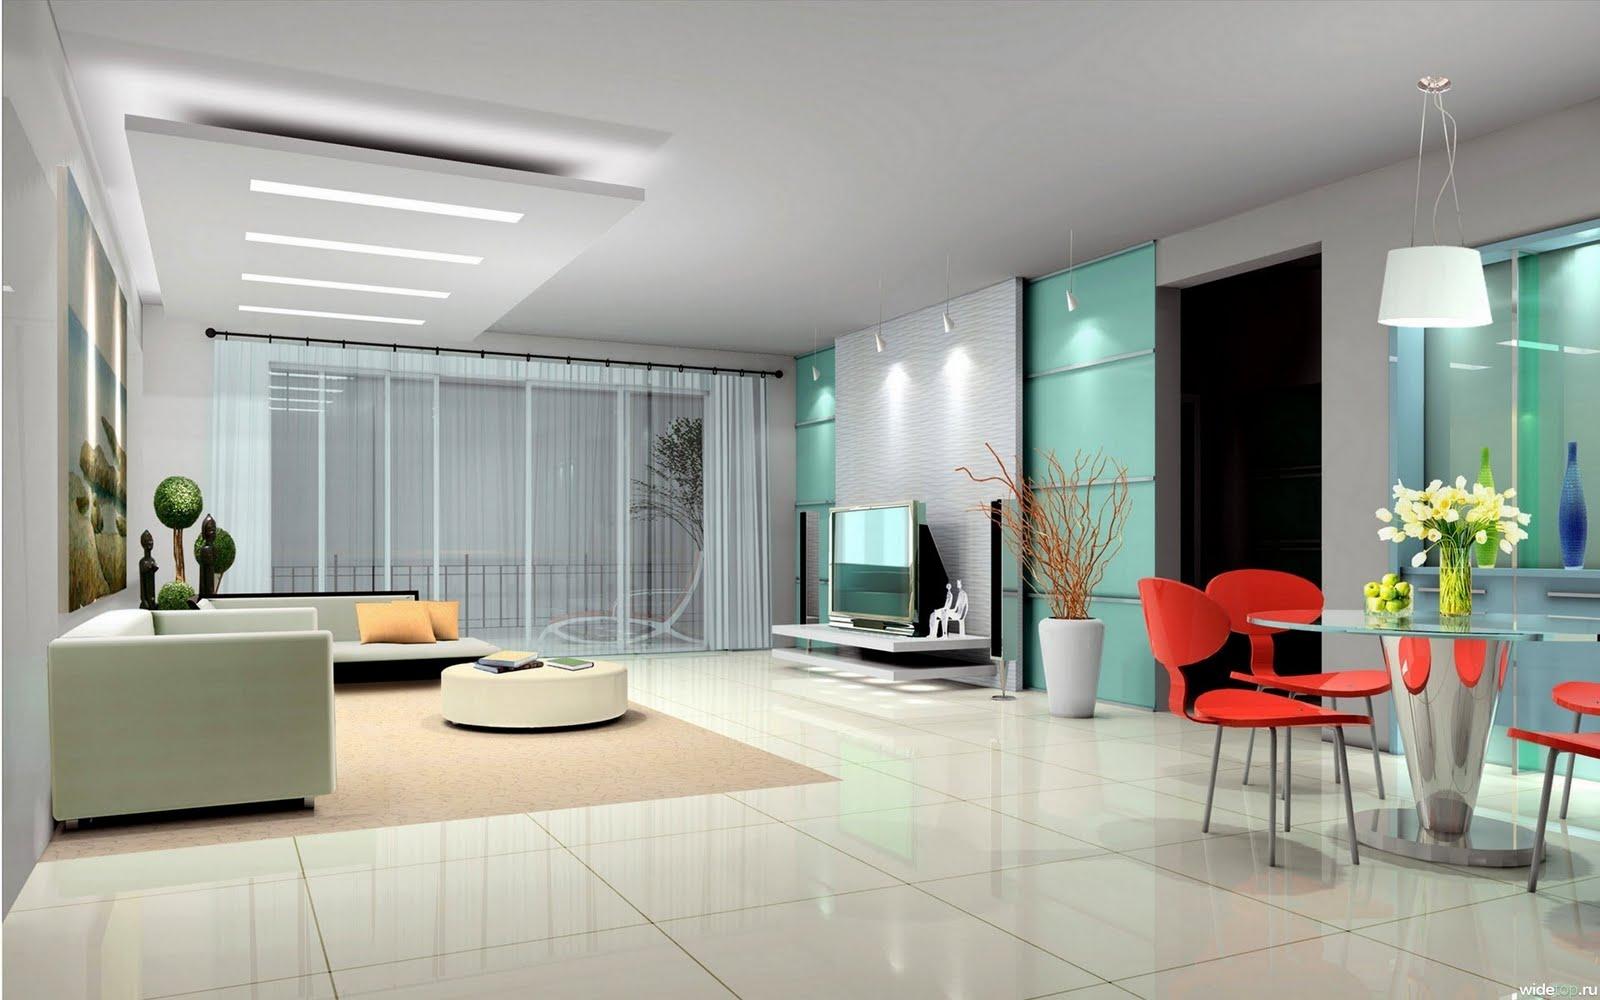 http://2.bp.blogspot.com/-7K2ErVqiS48/TfZSwpHD2KI/AAAAAAAAgjw/kFb12D63s7Q/s1600/cool-living-room-3.jpg